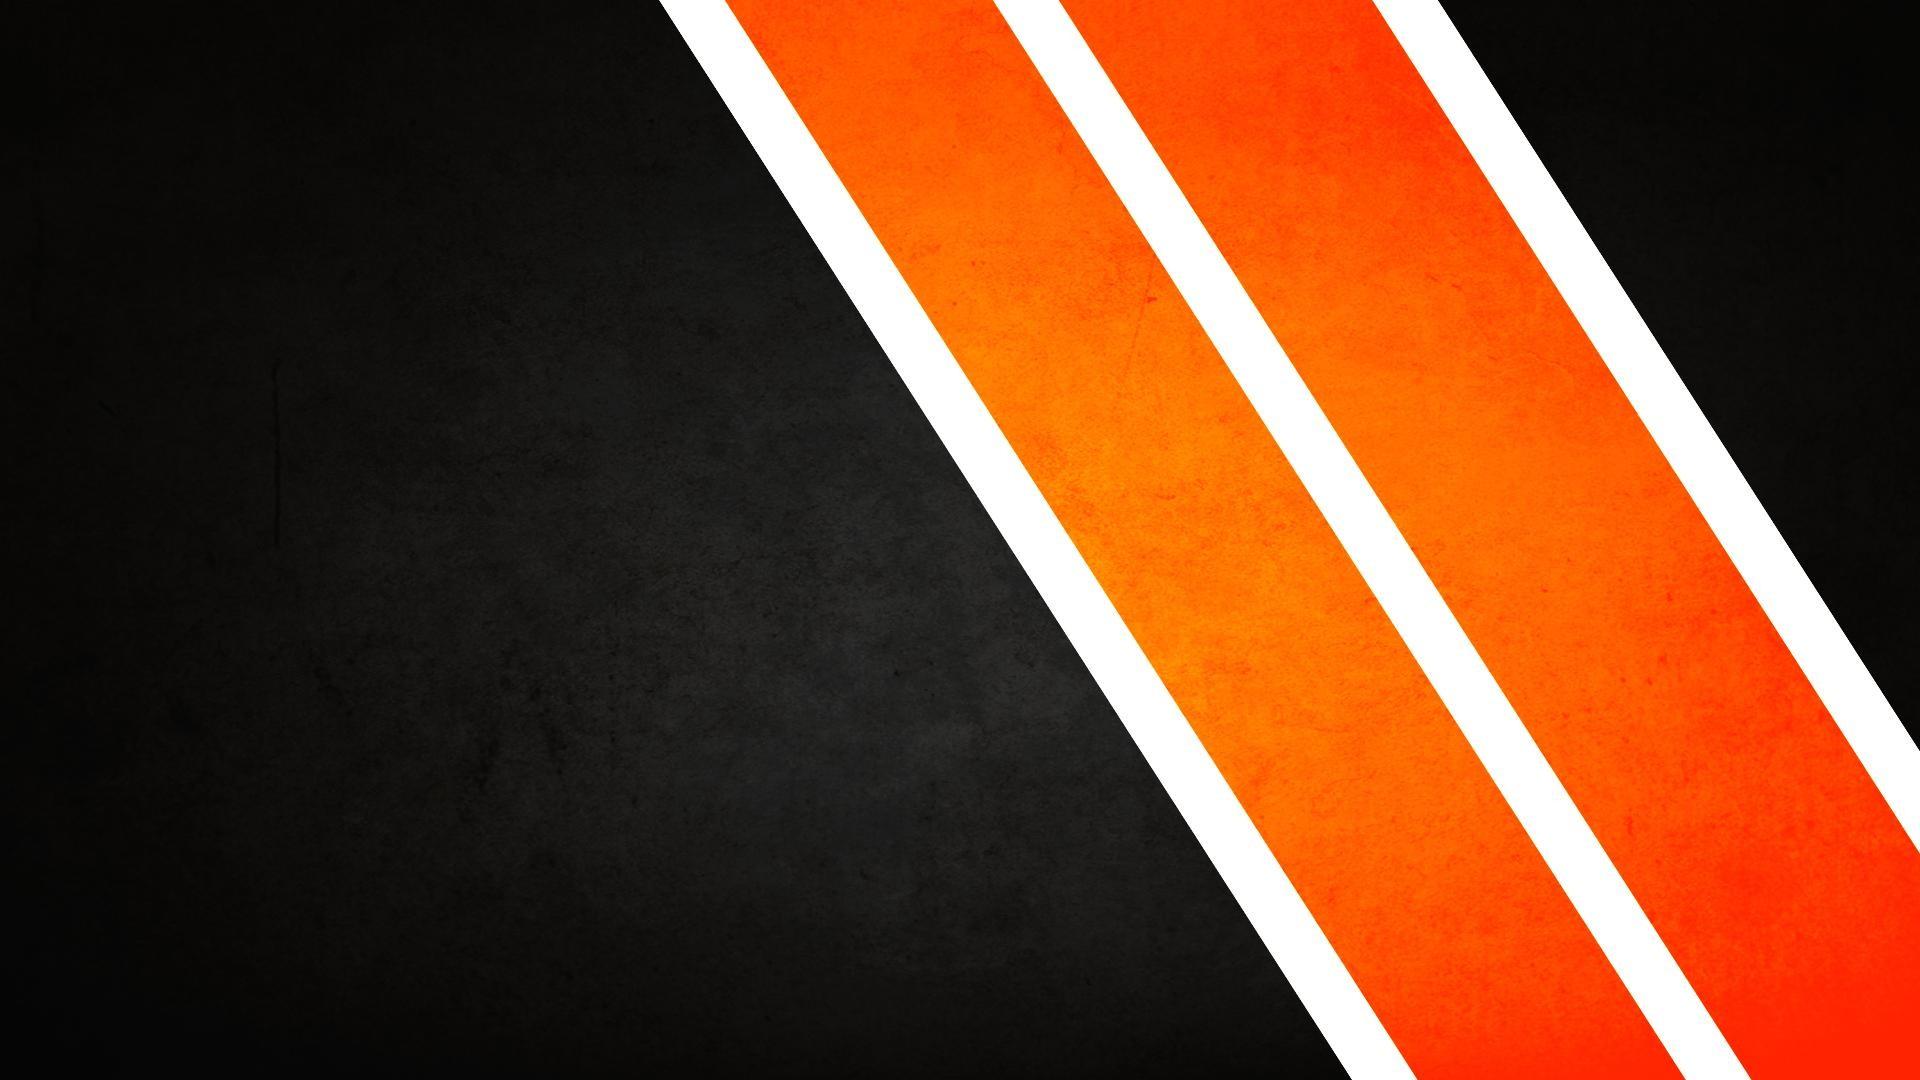 download image orange and - photo #43